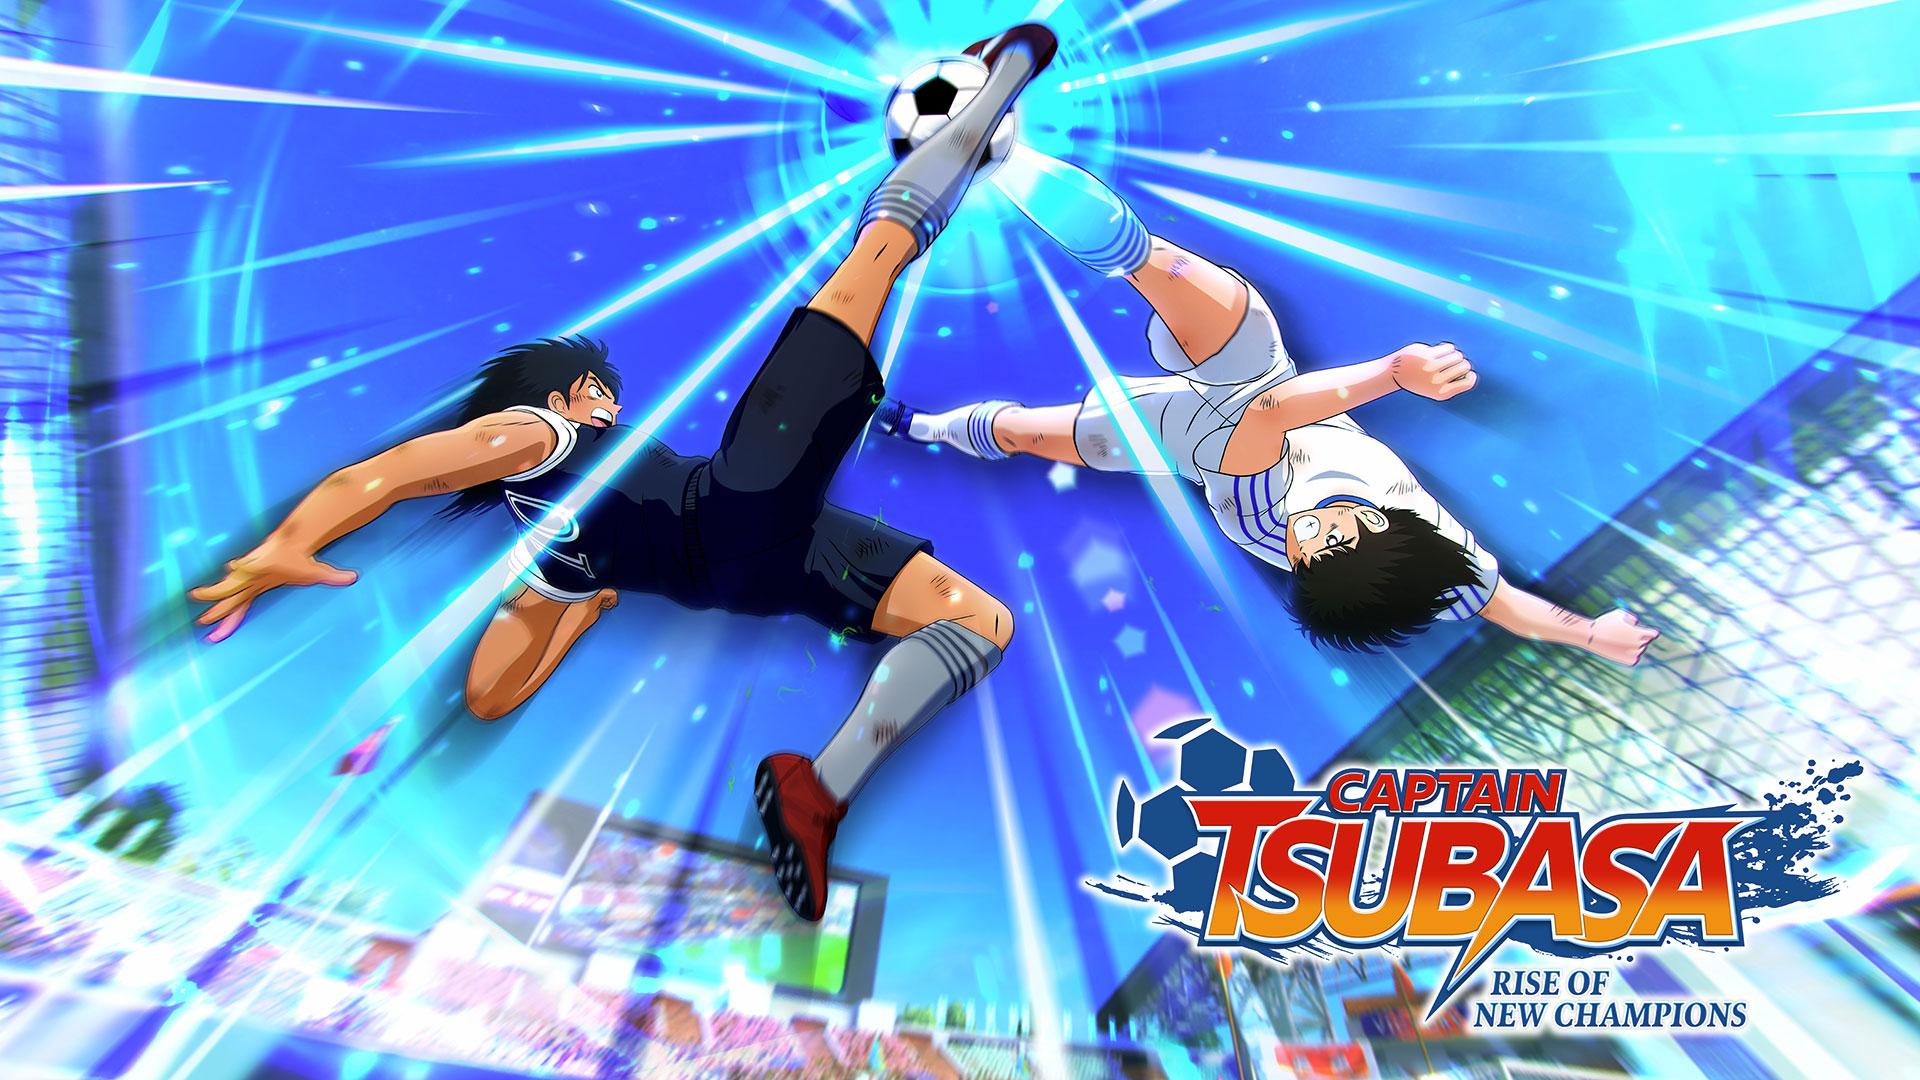 On a testé le jeu Captain Tsubasa: Rise of New Champions